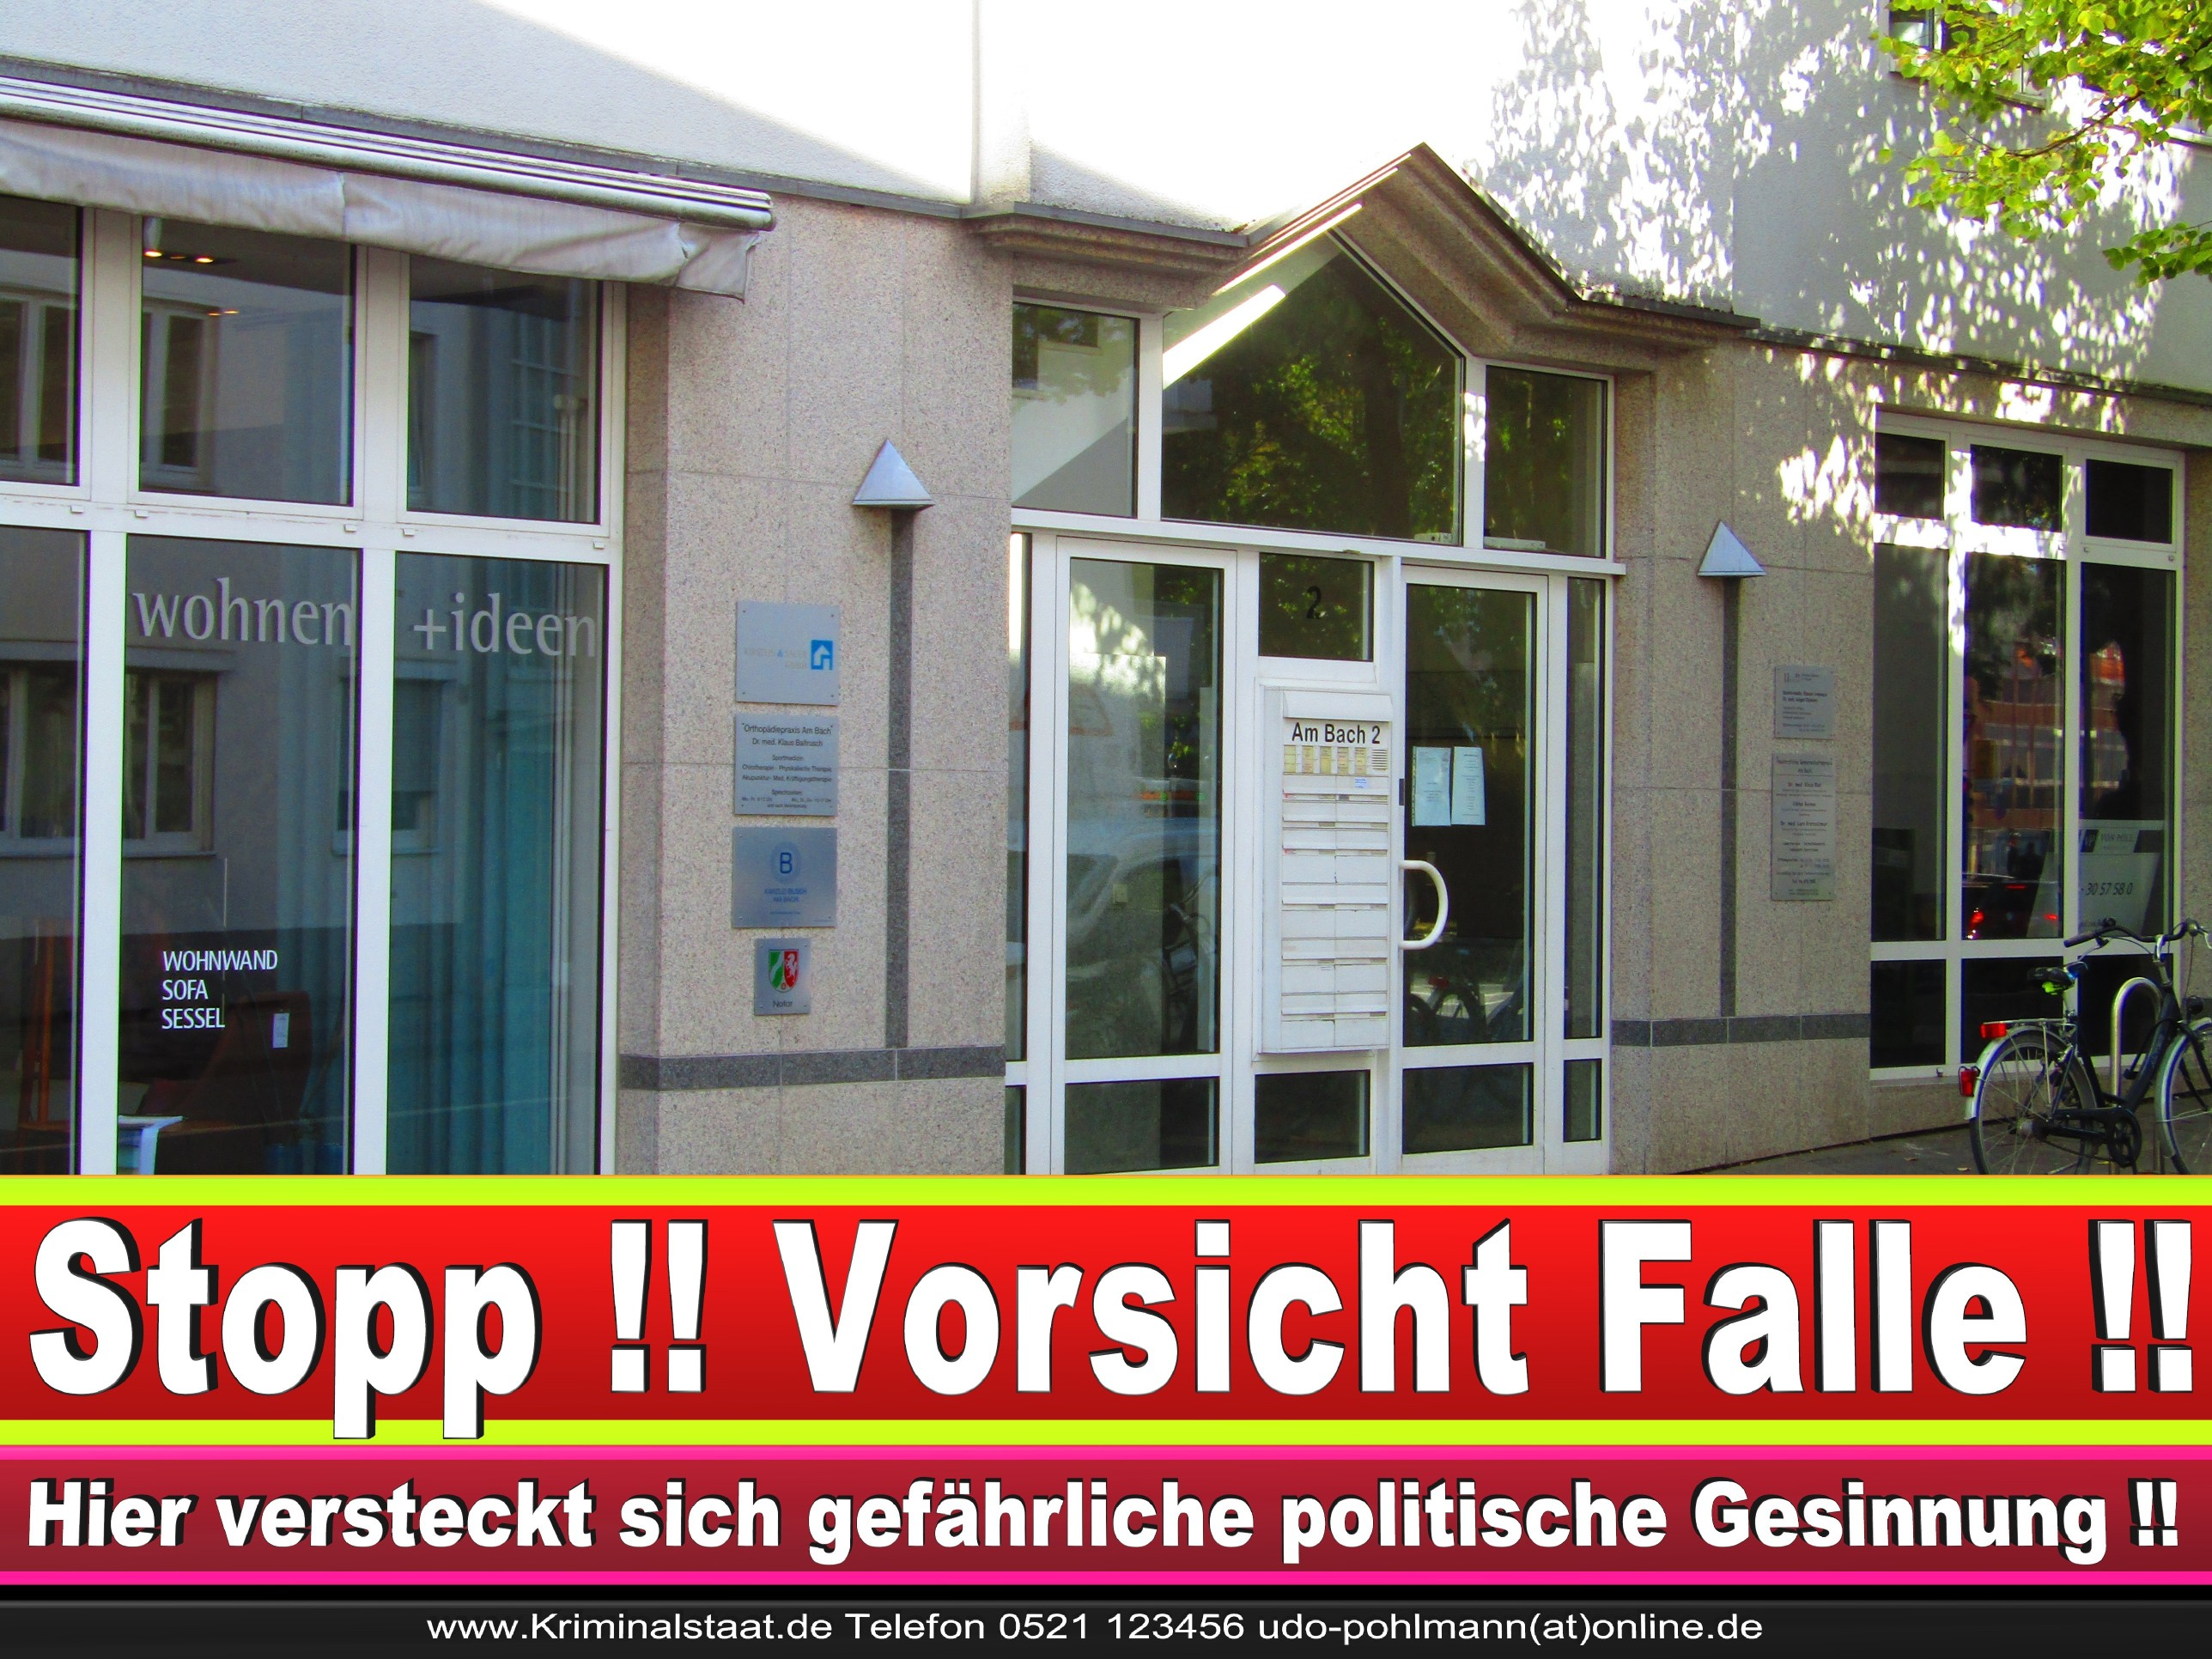 Rechtsanwältin Amelie Busch Am Bach 2 Bielefeld CDU 11